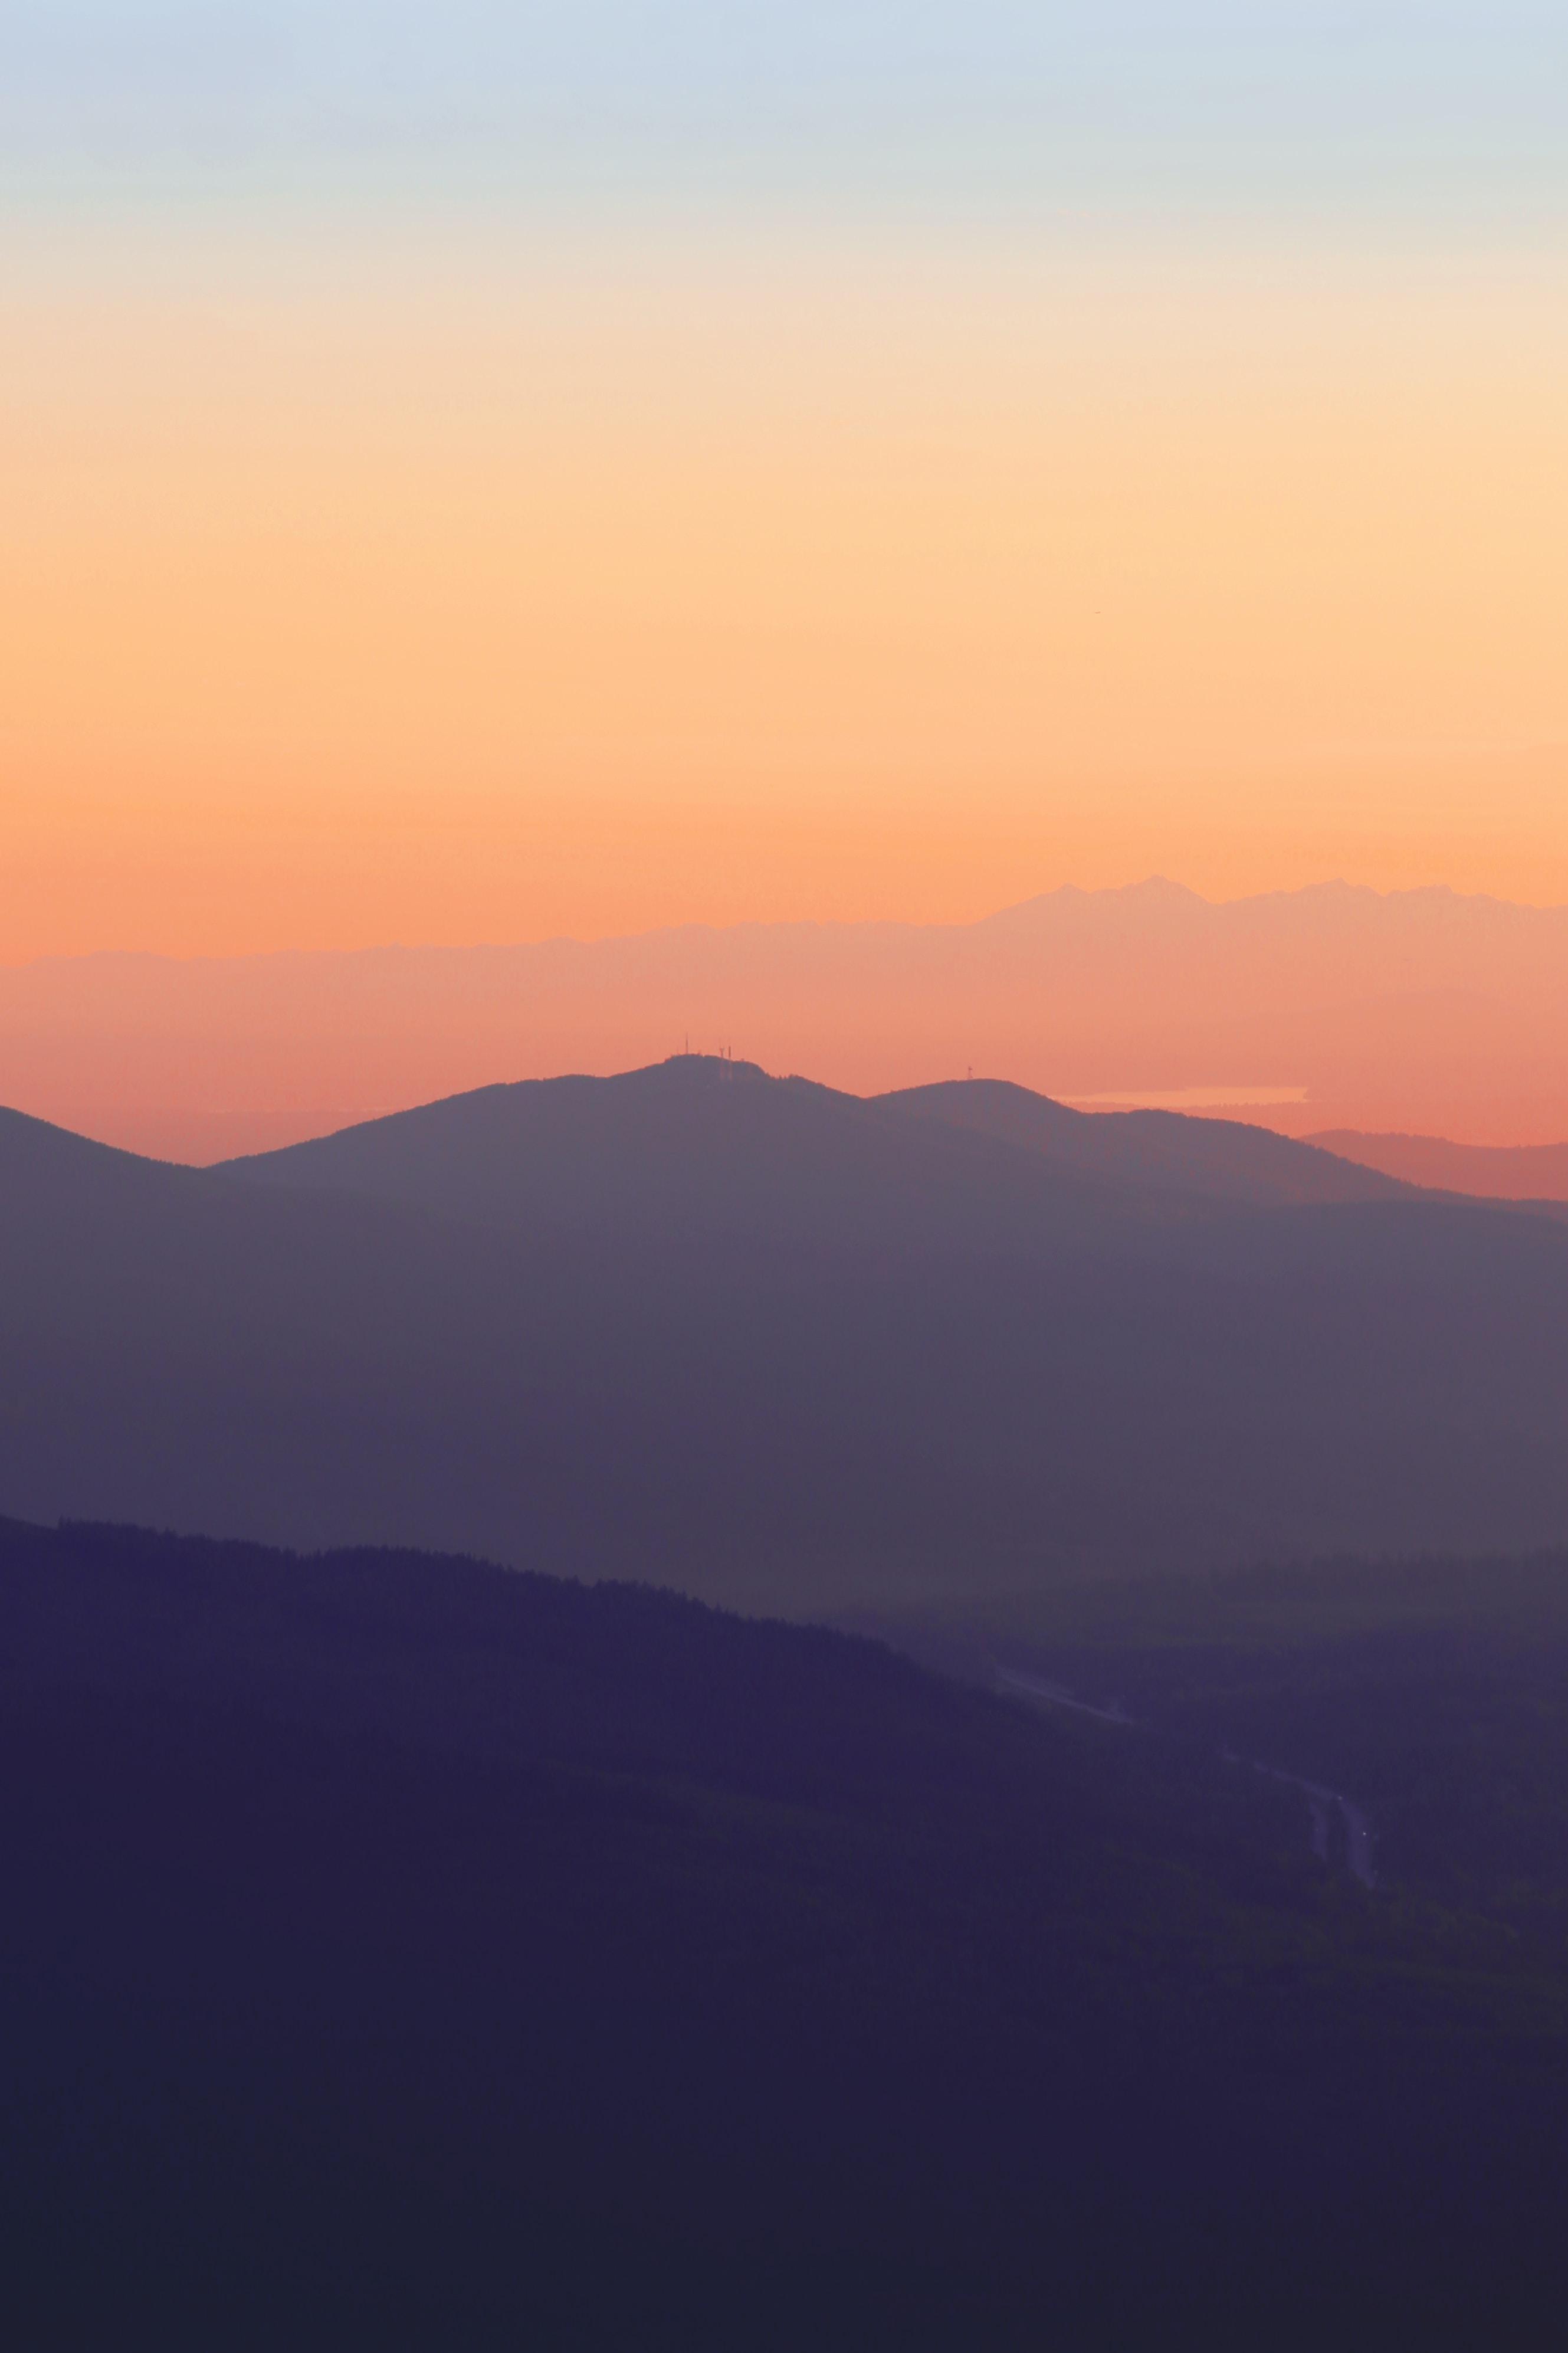 silhouette of mountain photo taken during sunset